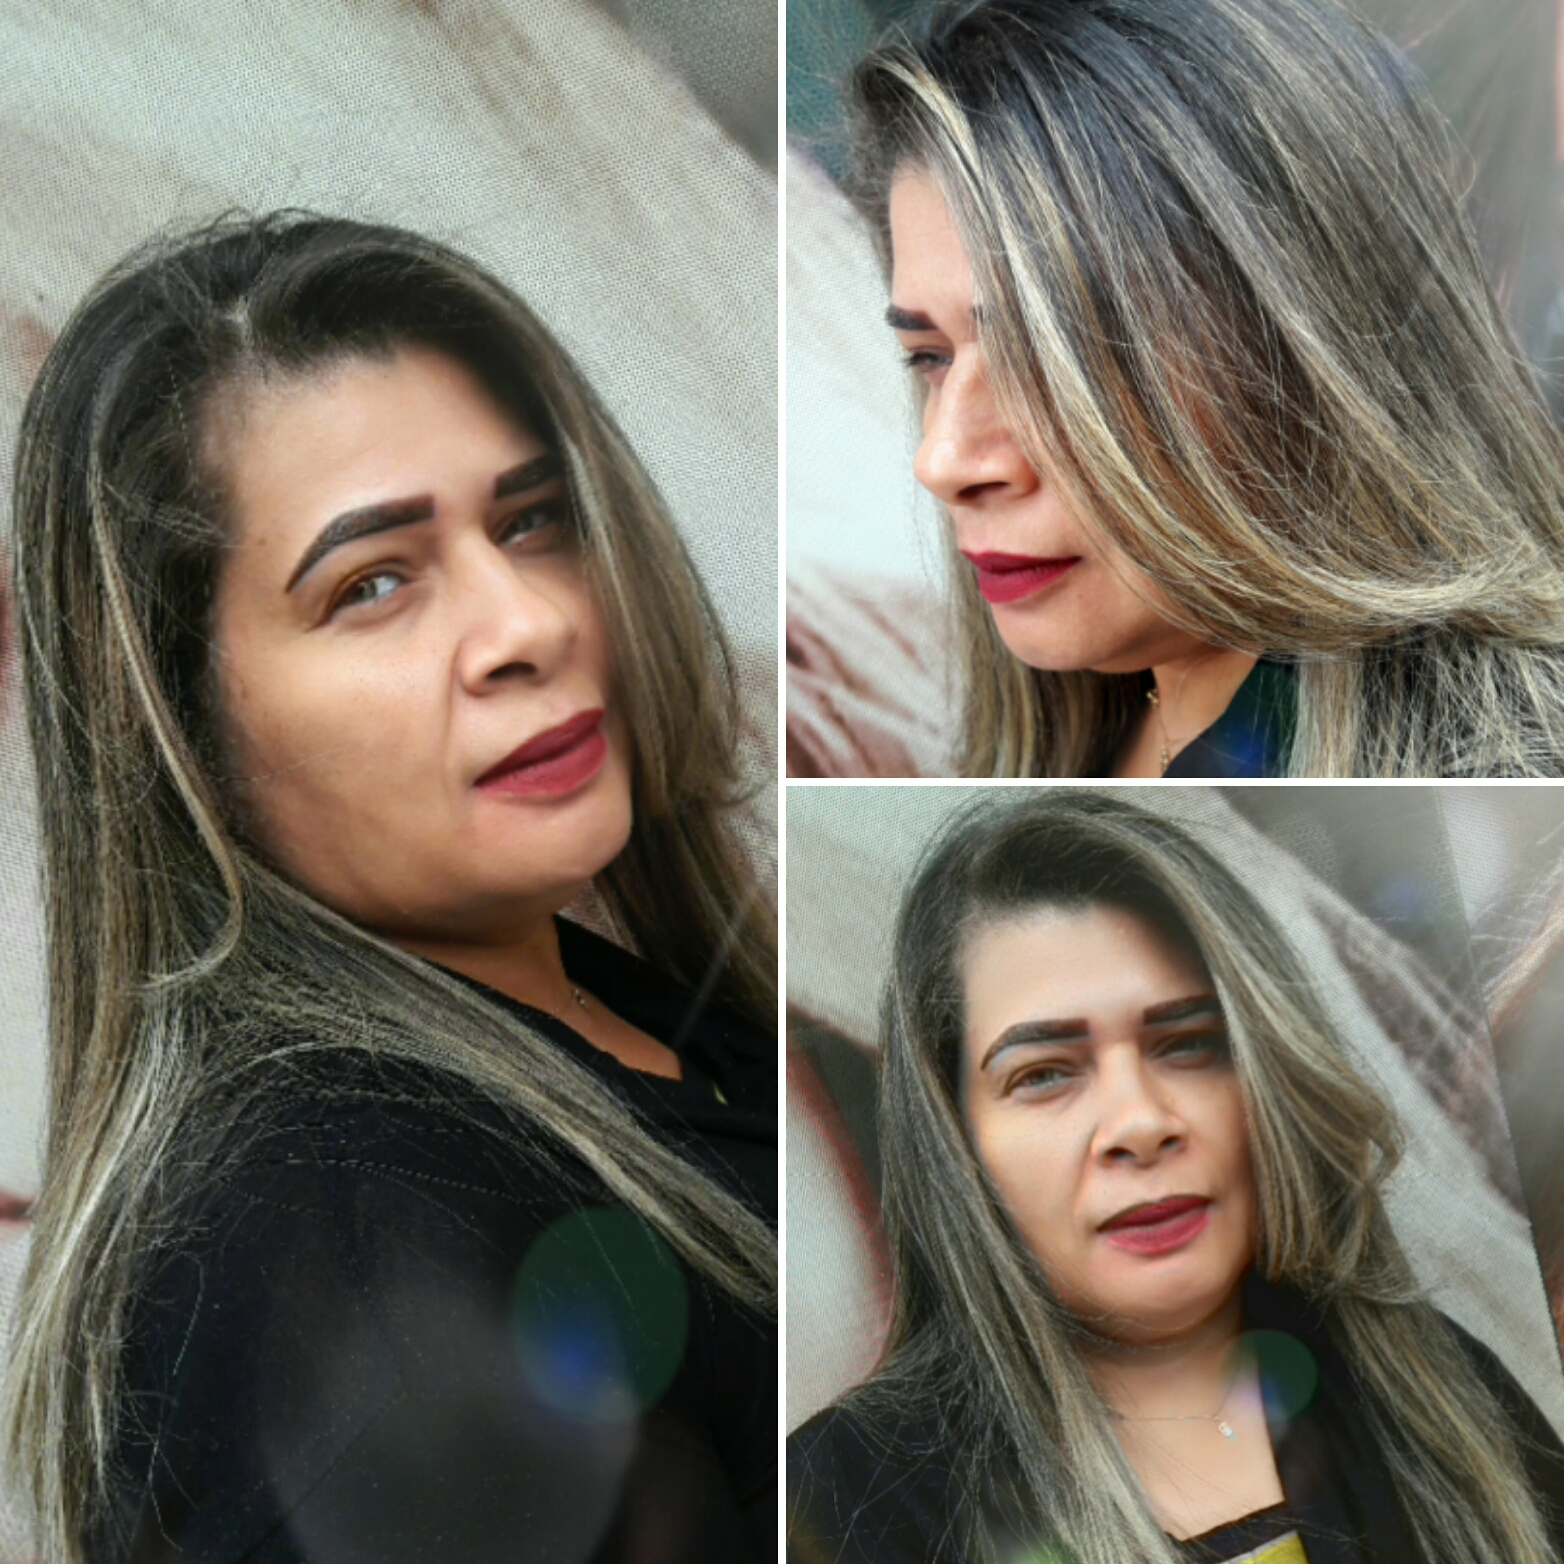 Luzes discretas, haircontour. #hairstylist #hairdresser #haircut #beleza #beauty  @blessed.patty #salaodebeleza #blond #loira  cabelo cabeleireiro(a)